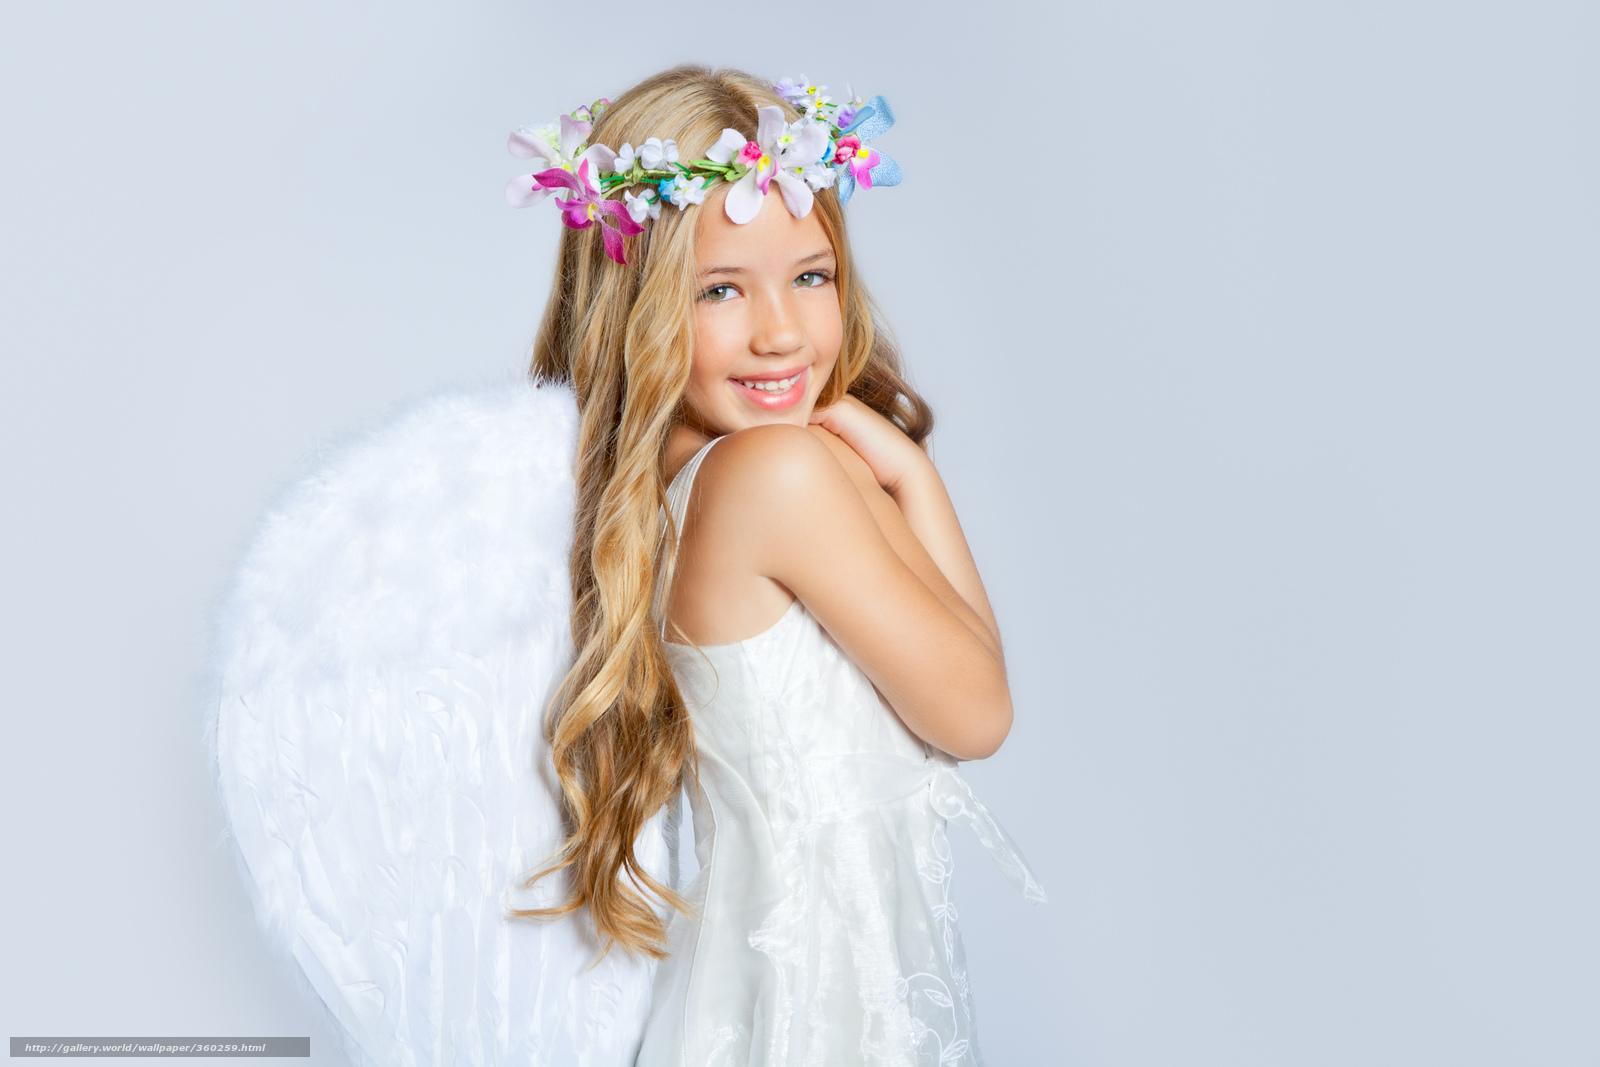 Flowers  angel  Happiness  beautiful girl  child  children  childhood